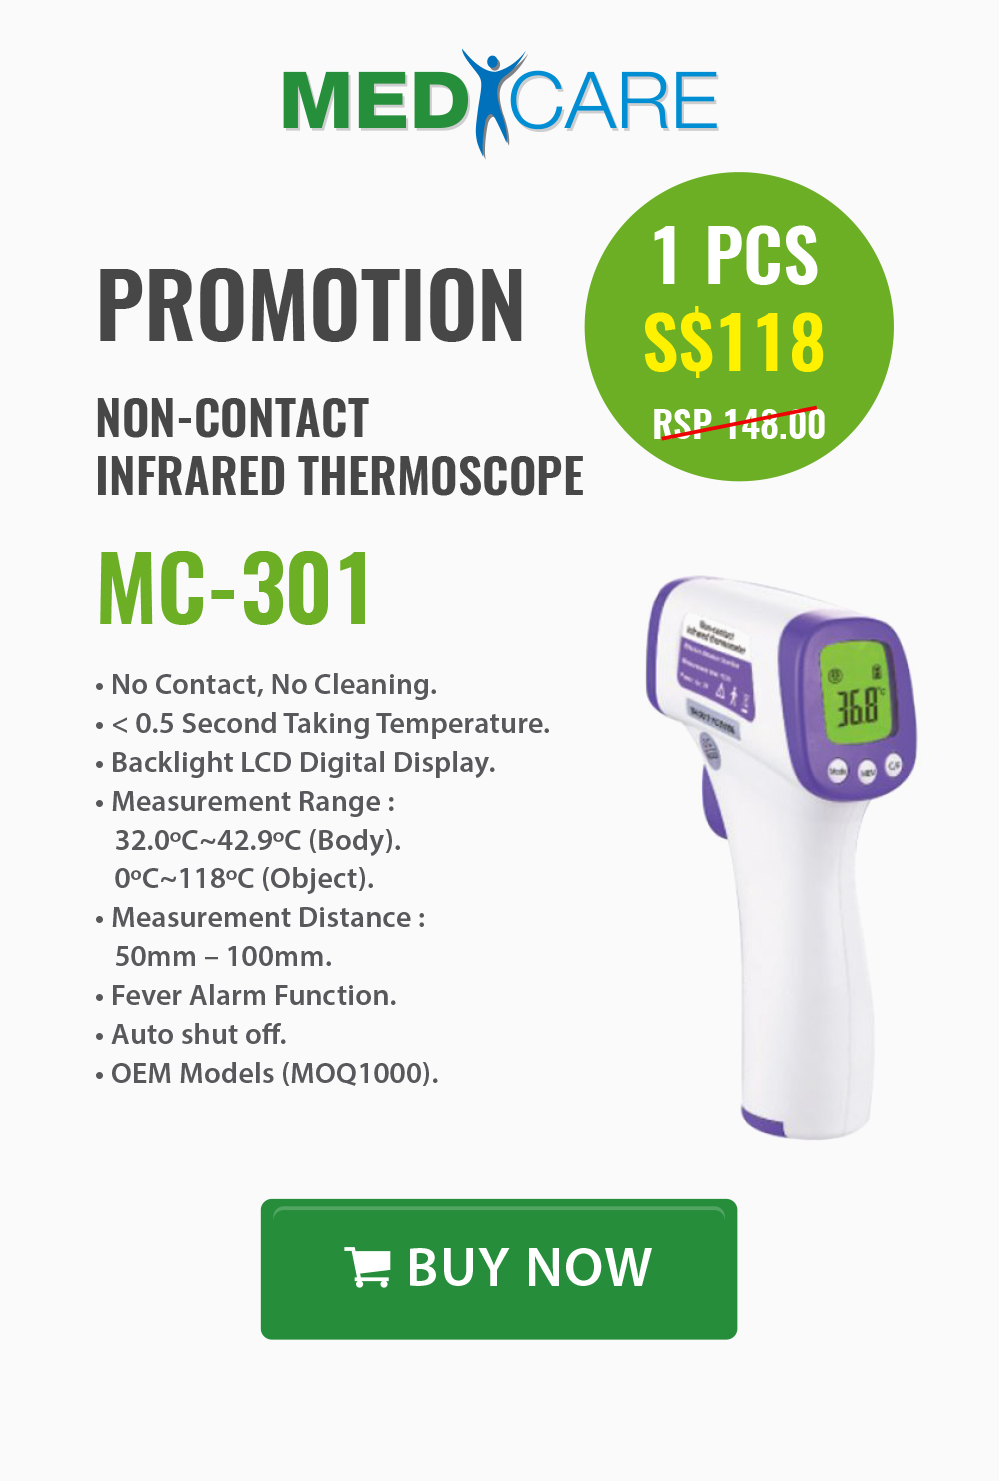 MC-301